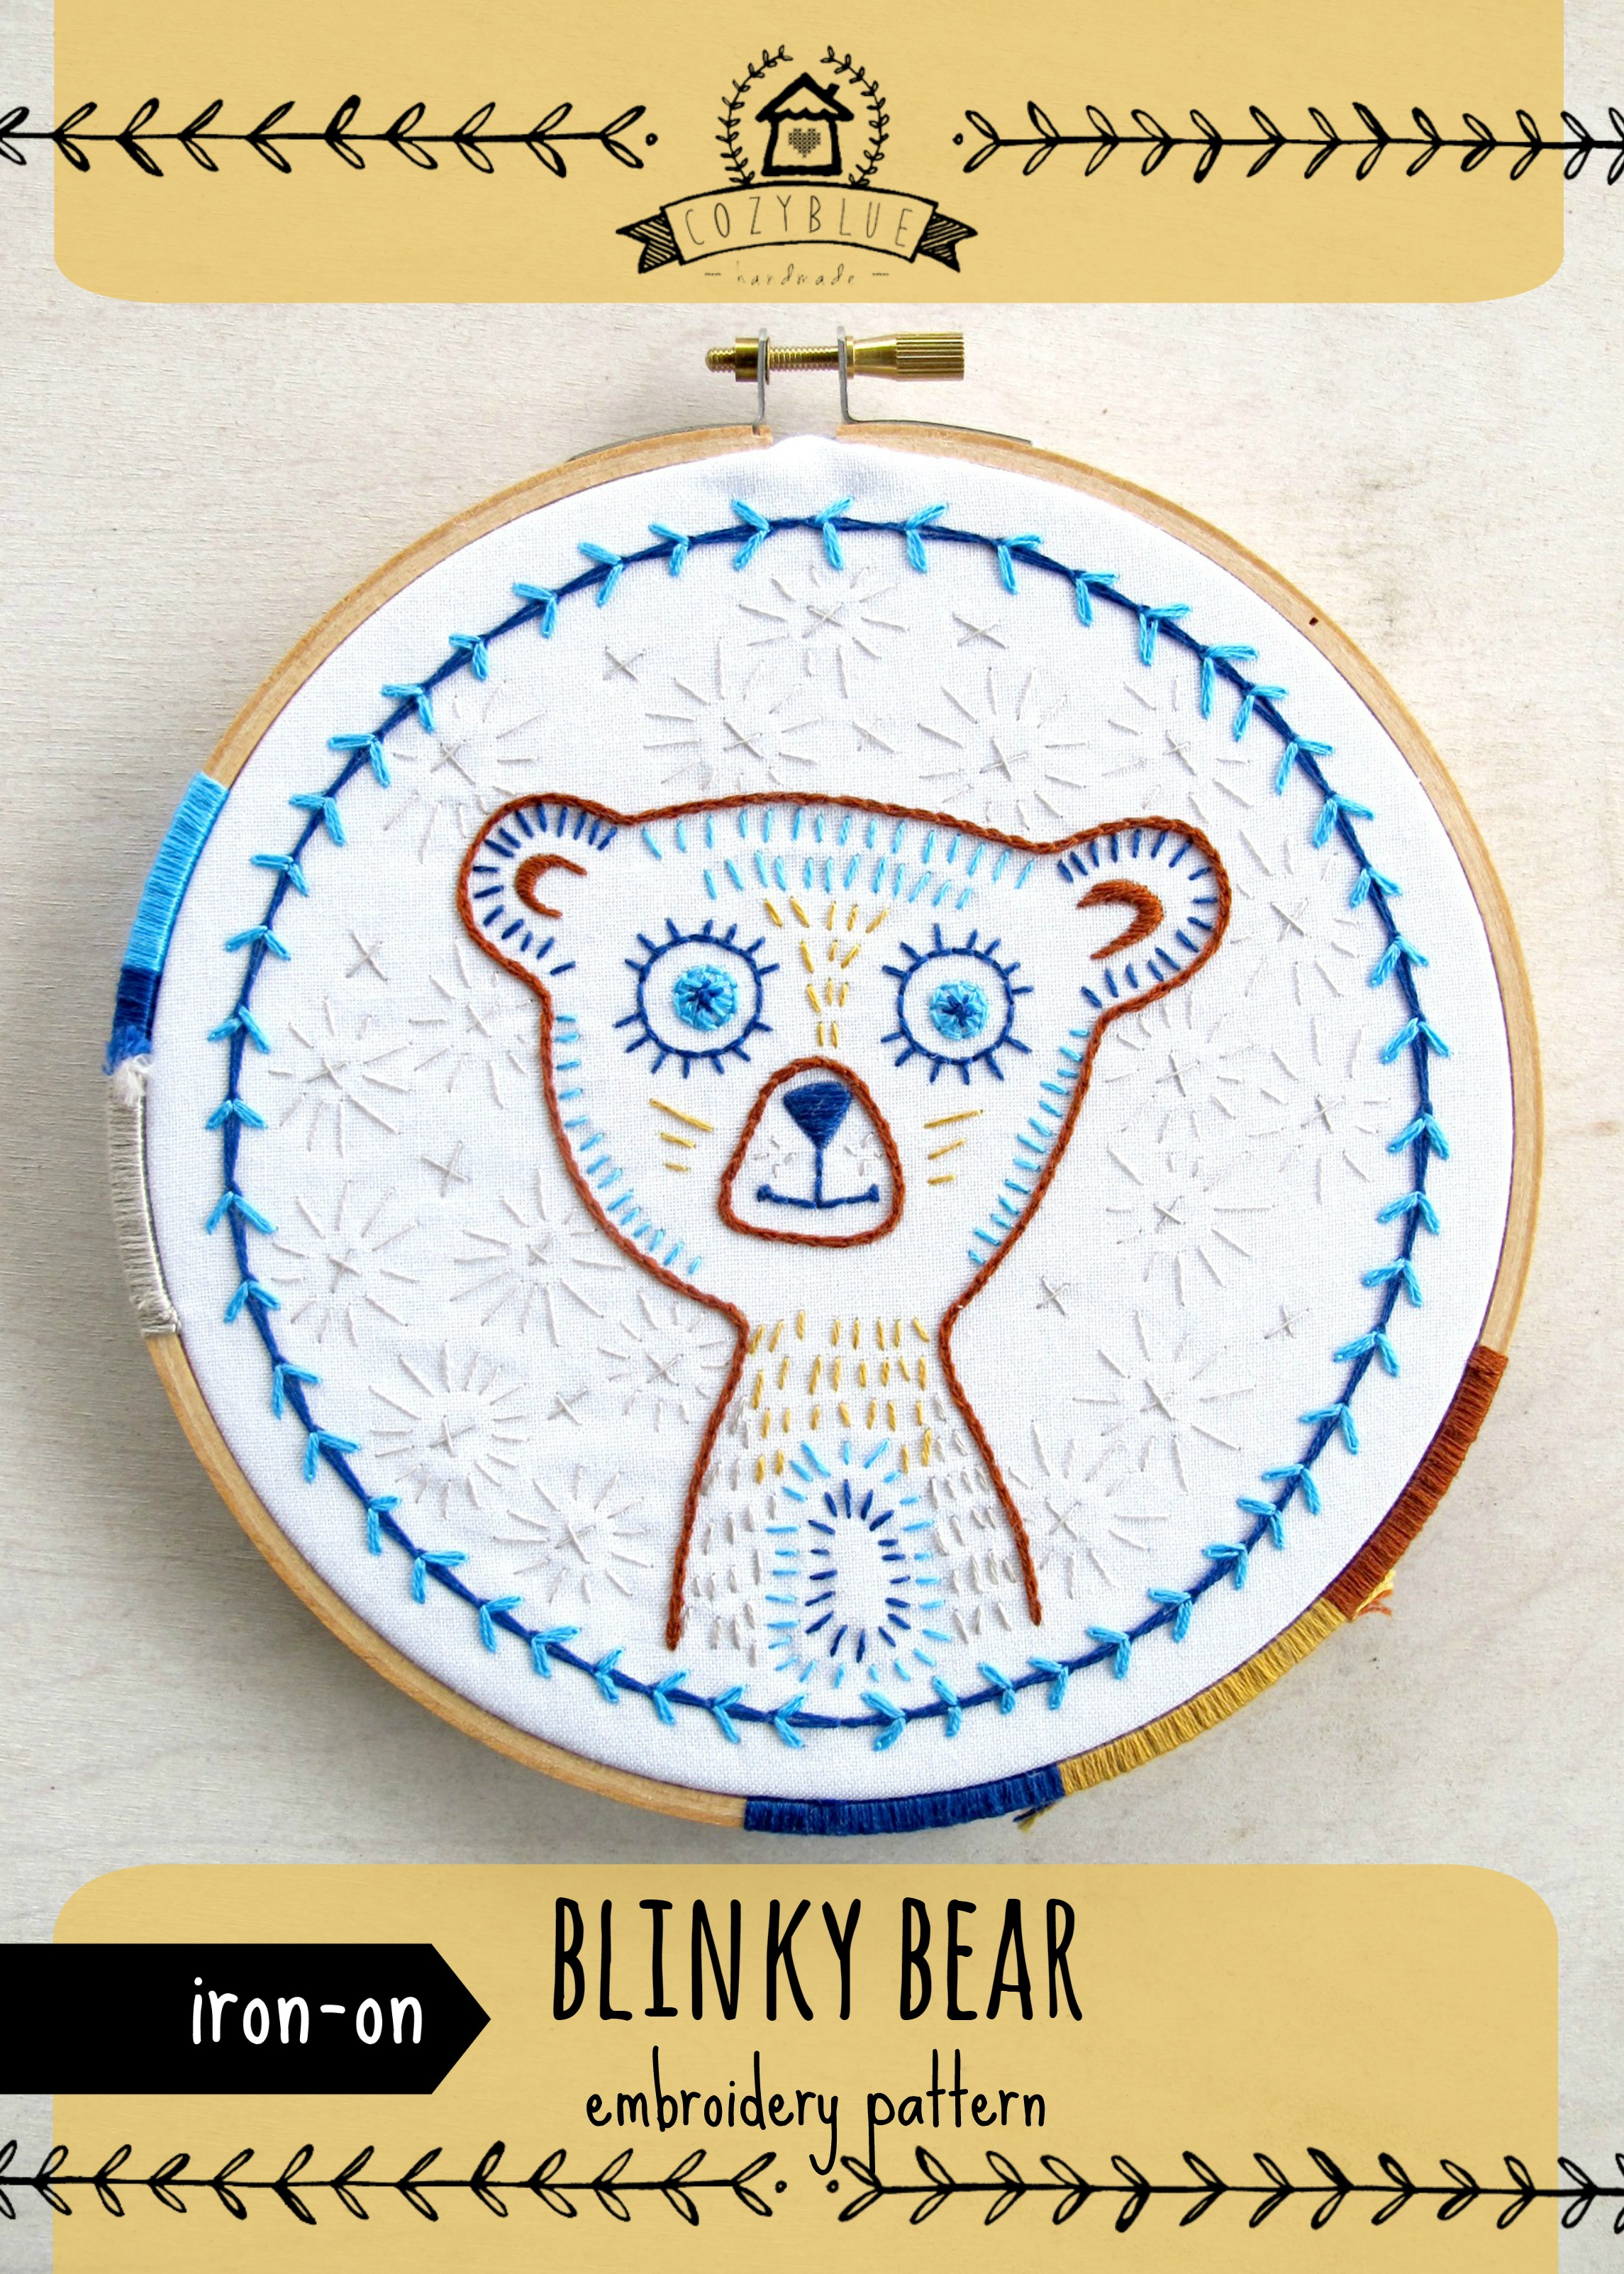 blinky bear iron on cover.jpg